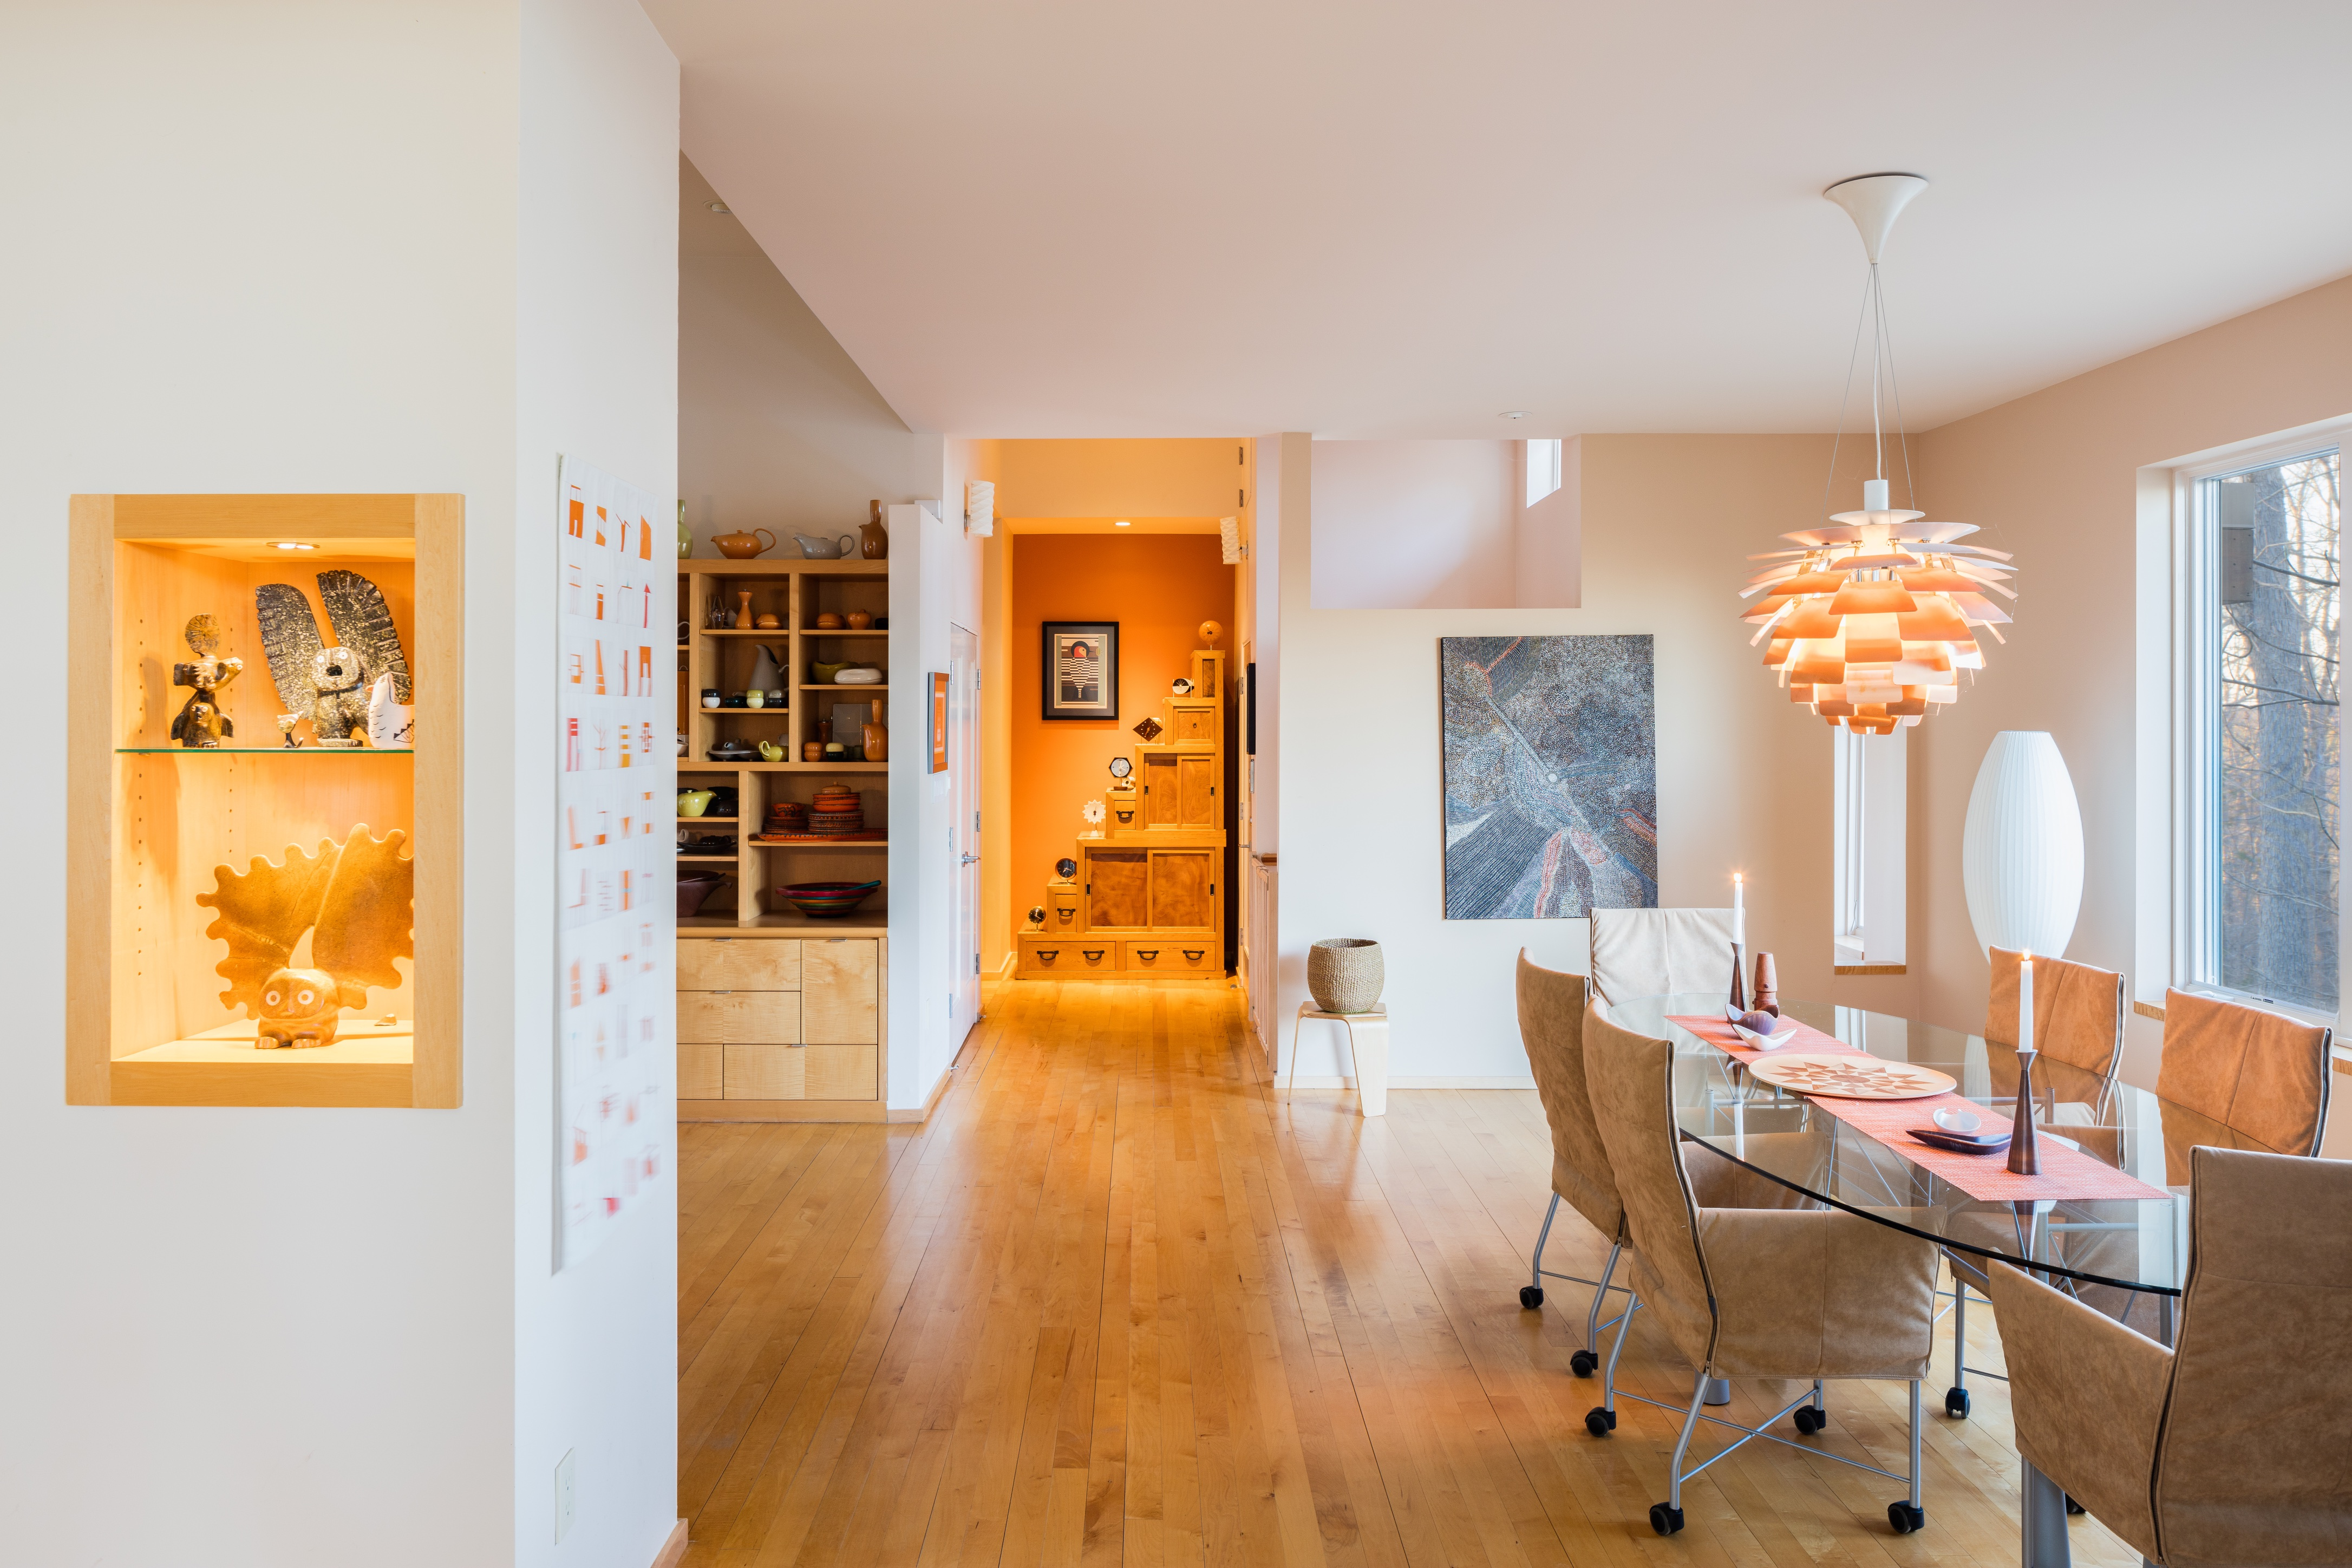 Interiors through view